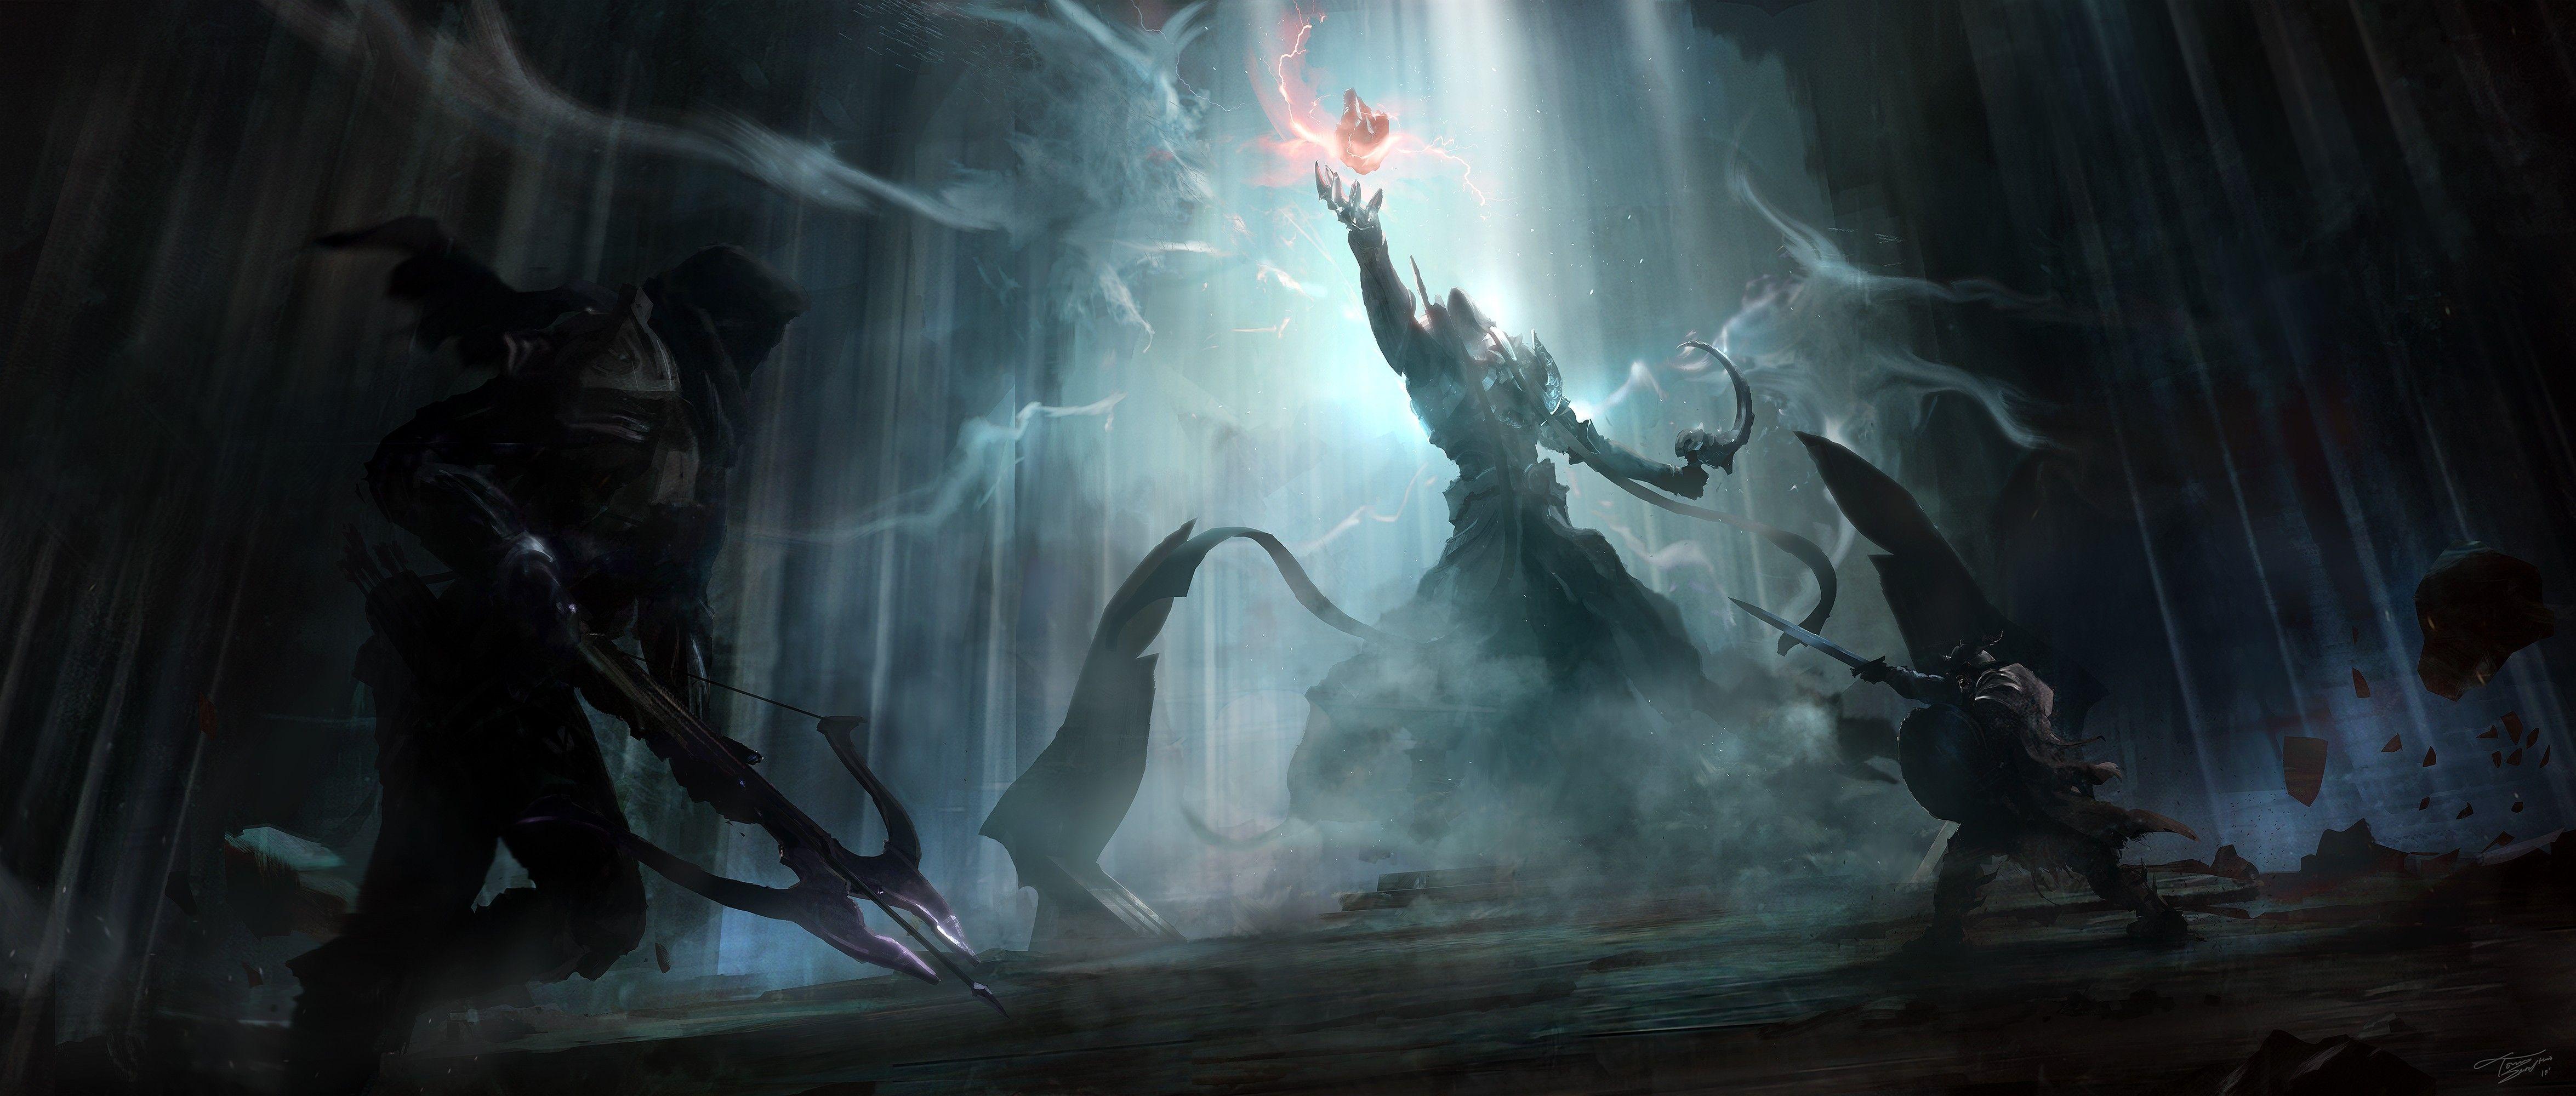 Diablo 3 Reaper Of Souls Warriors Boss Artwork Painting